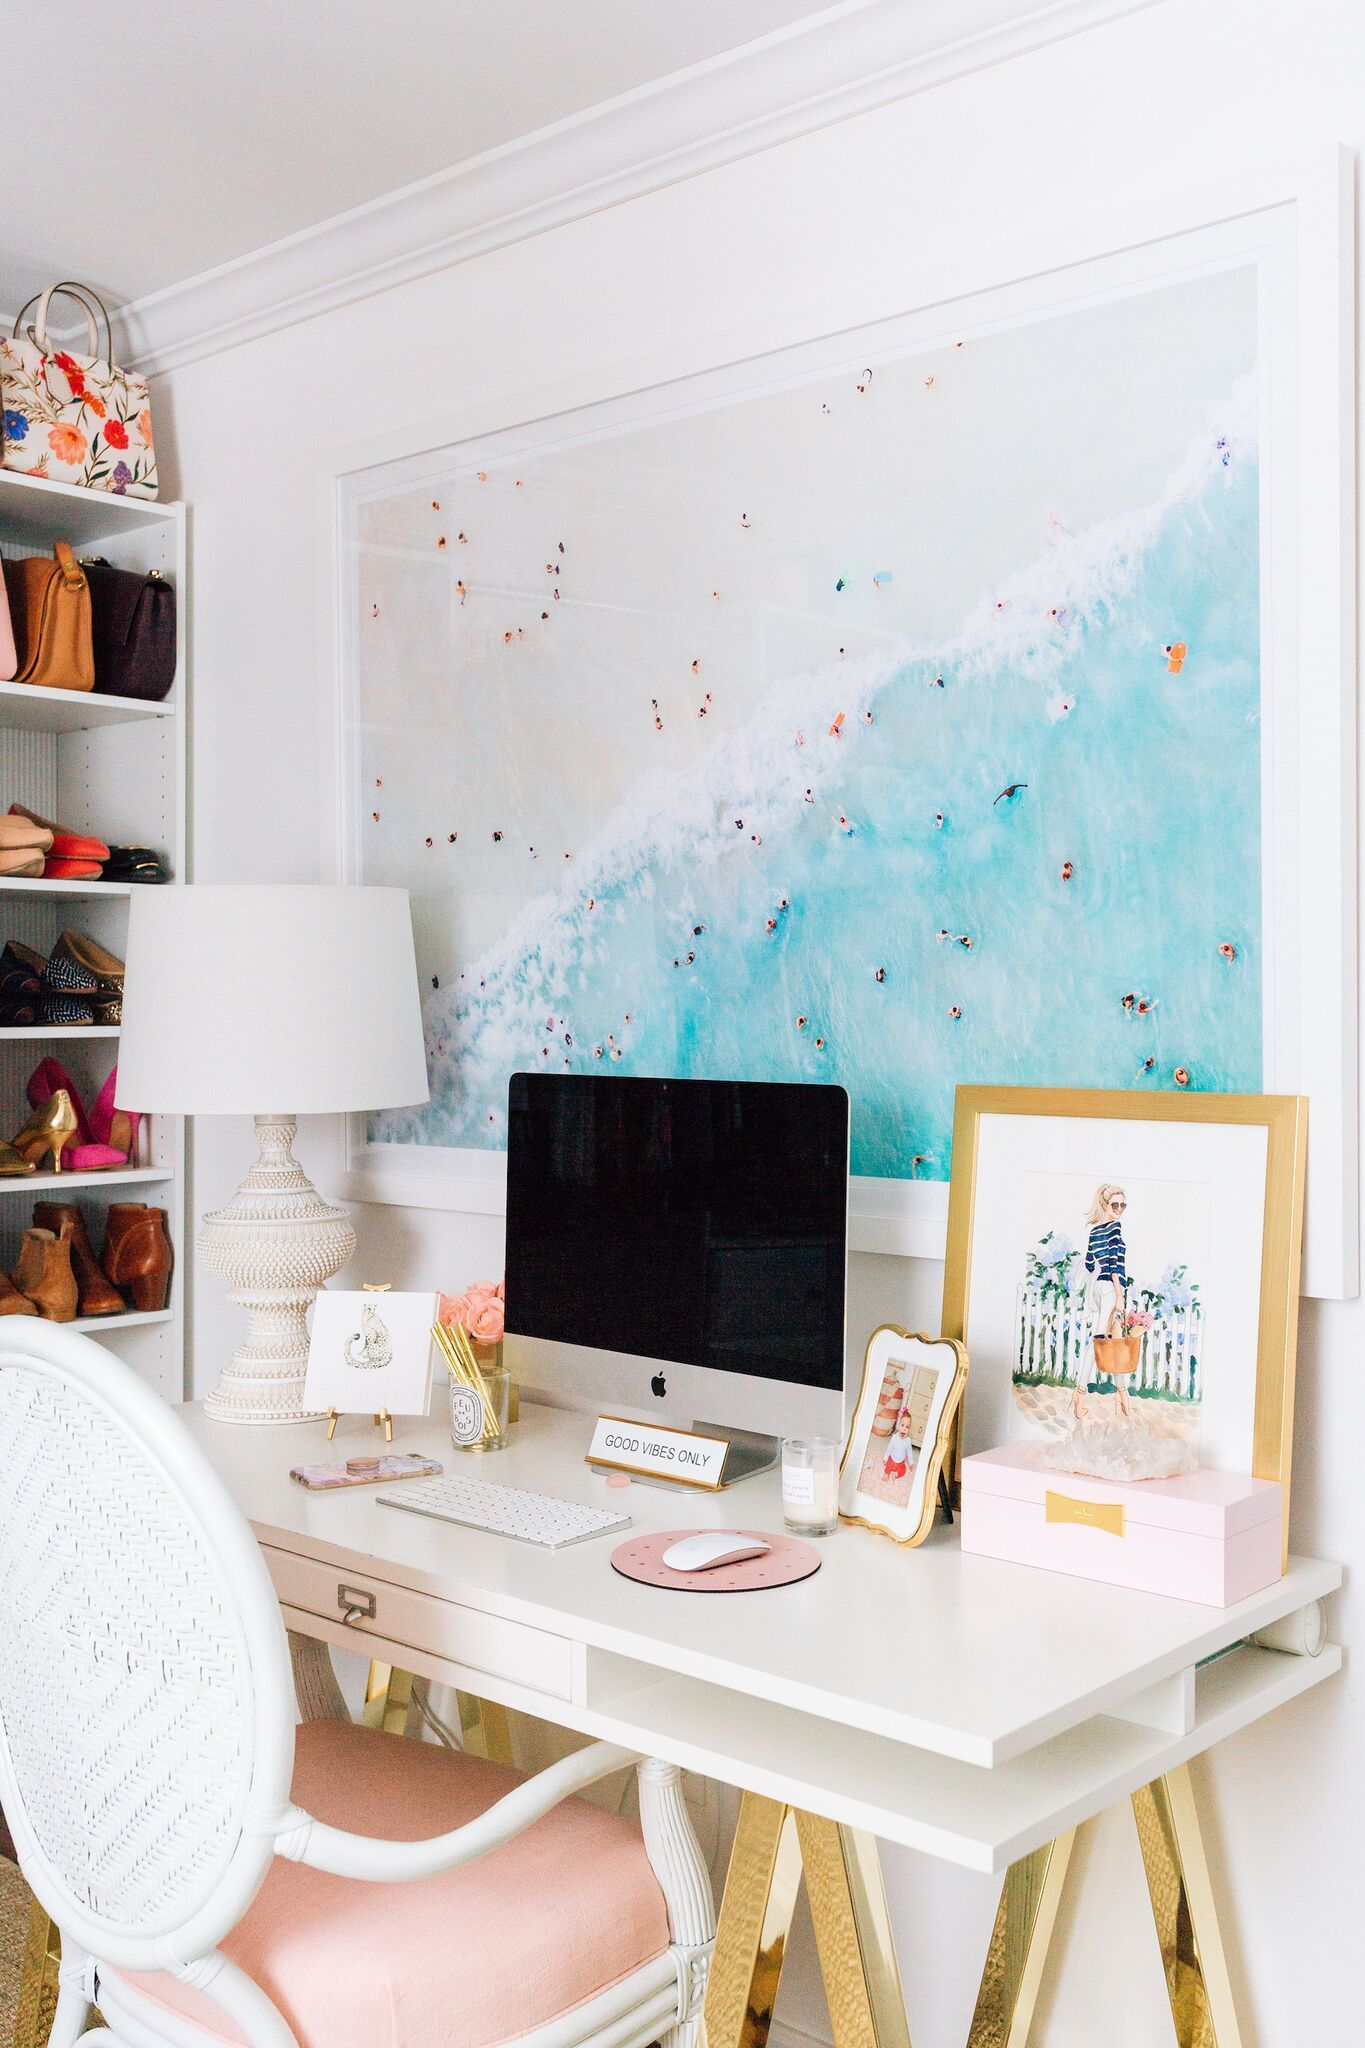 Home Room Tour Julia Of Lemon Stripe S Beachy Office Vibes Home